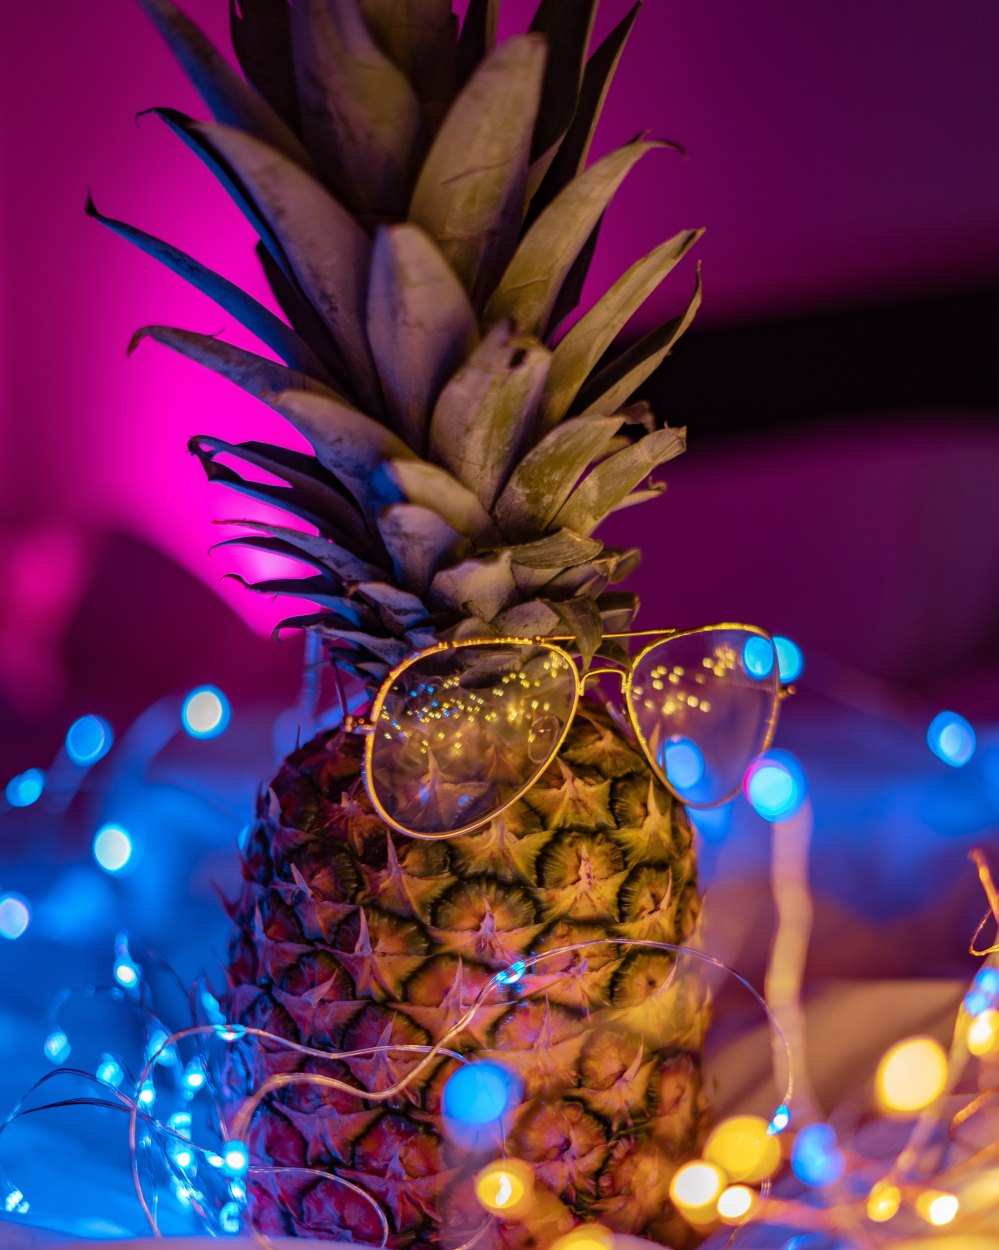 pineapple-supply-co-652277-unsplash.jpg